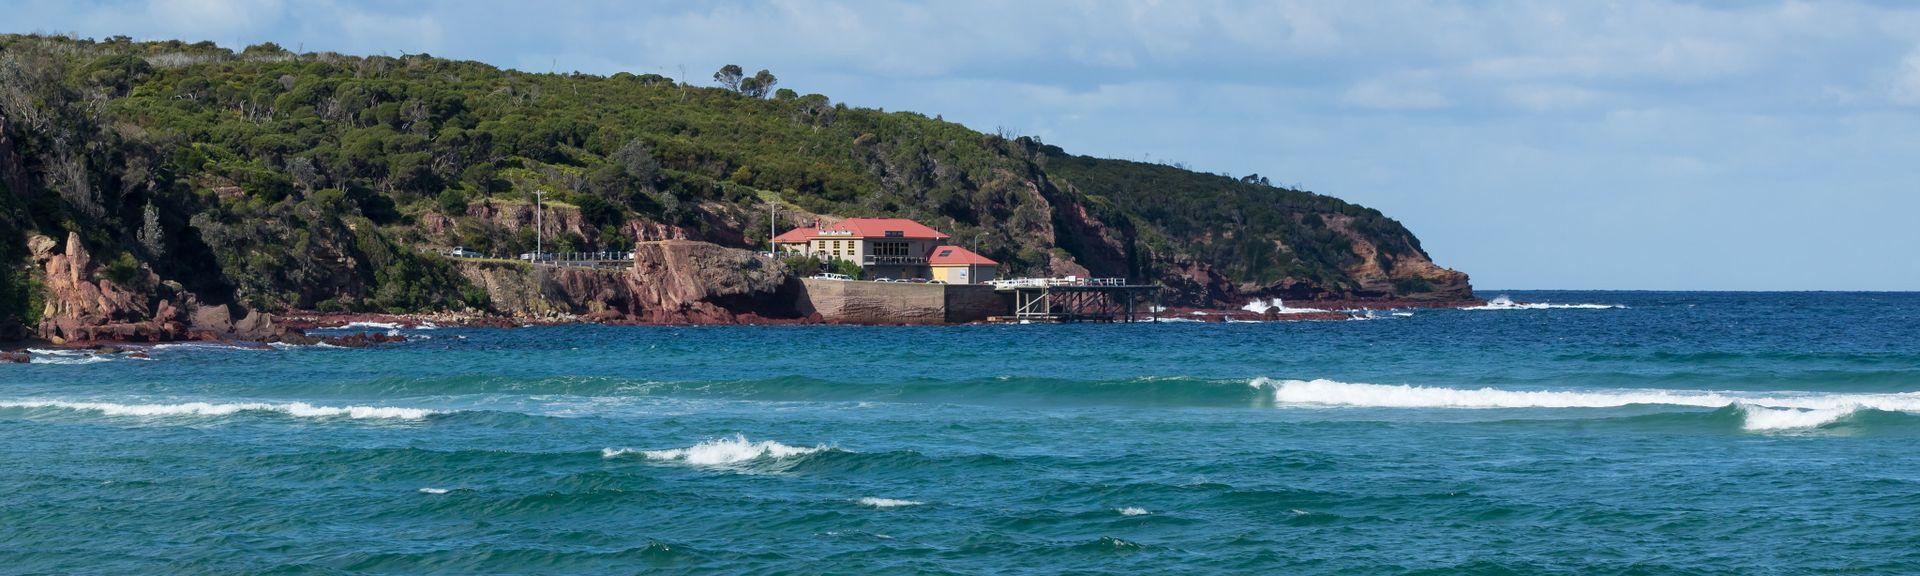 Sapphire Coast Marine Discovery Centre, Eden, New South Wales, Australia